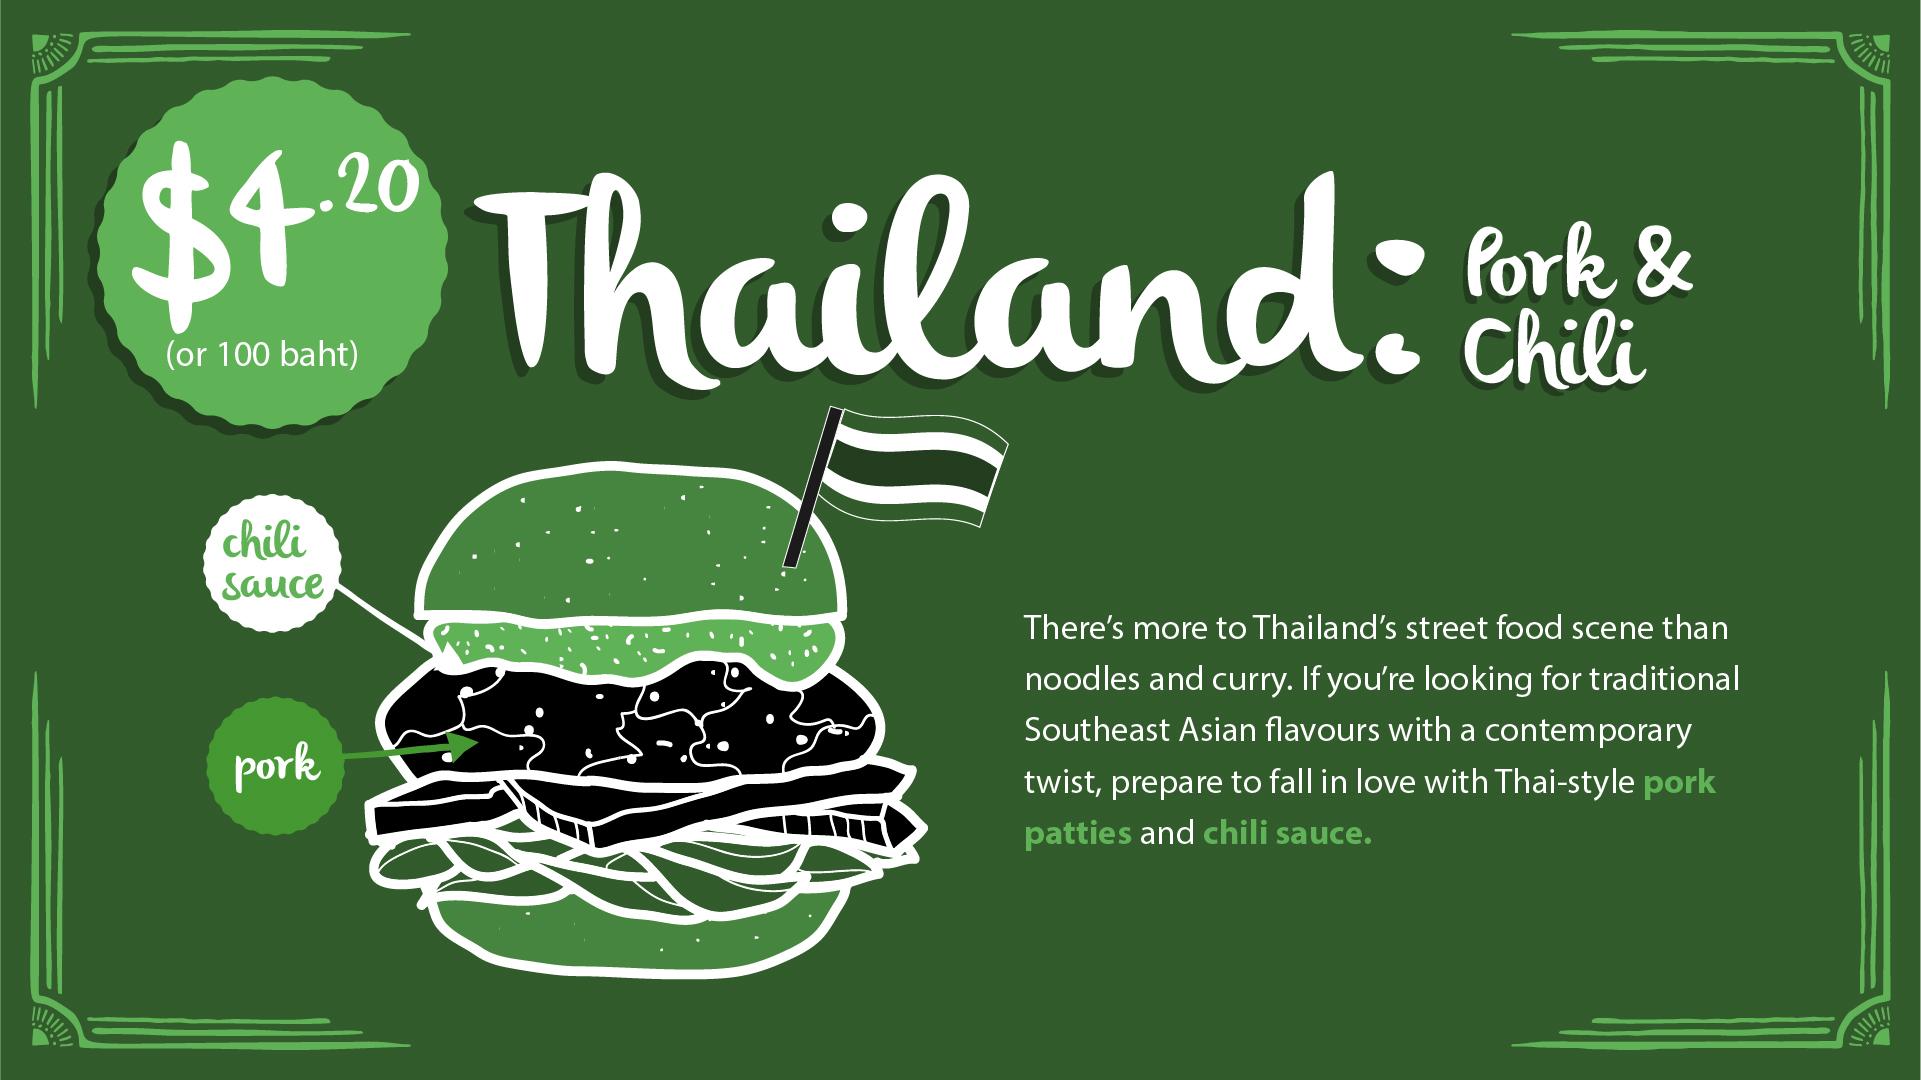 Thailand burger